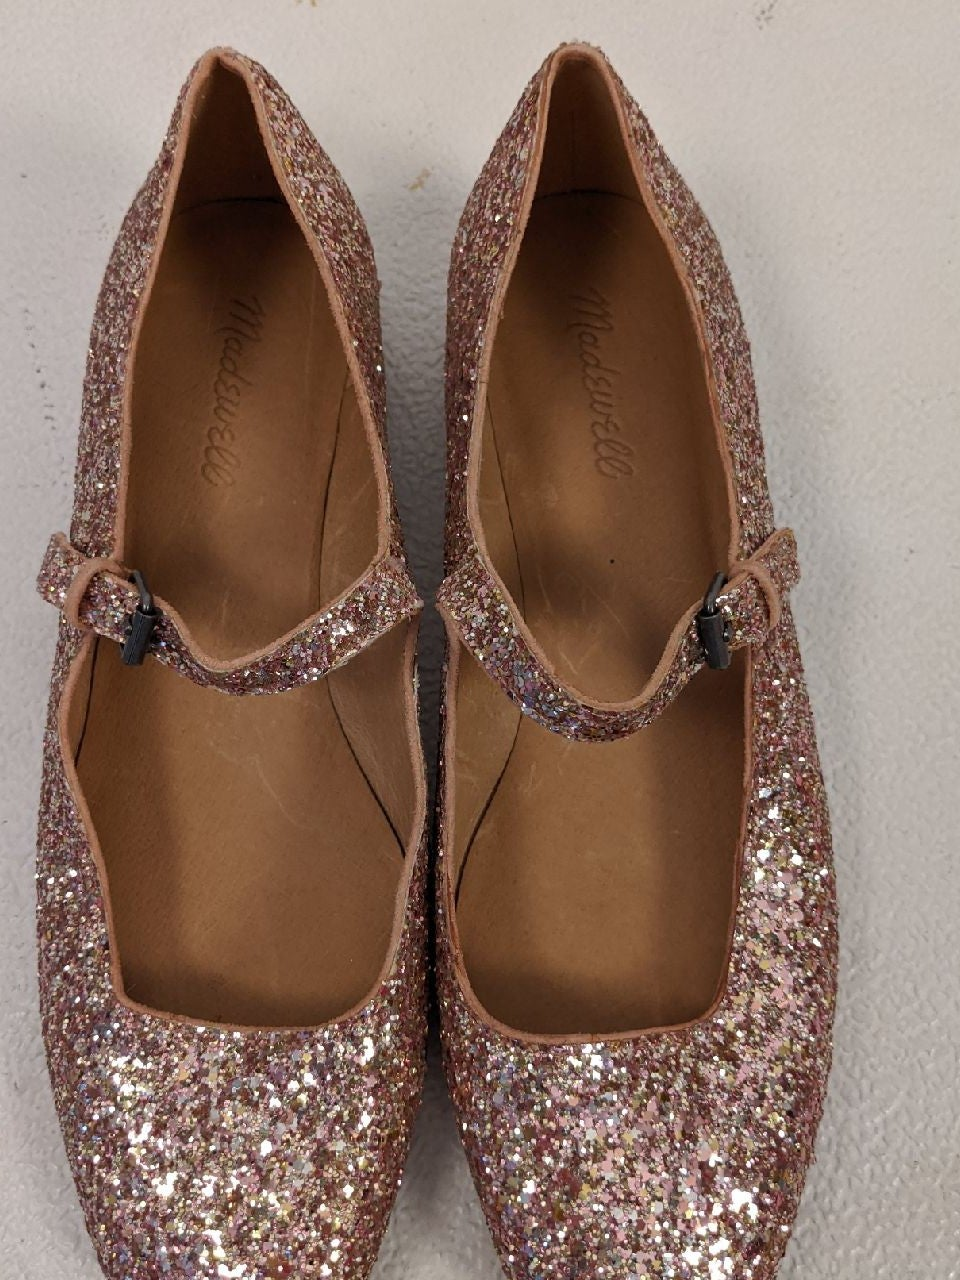 the delilah mary jane in glitter